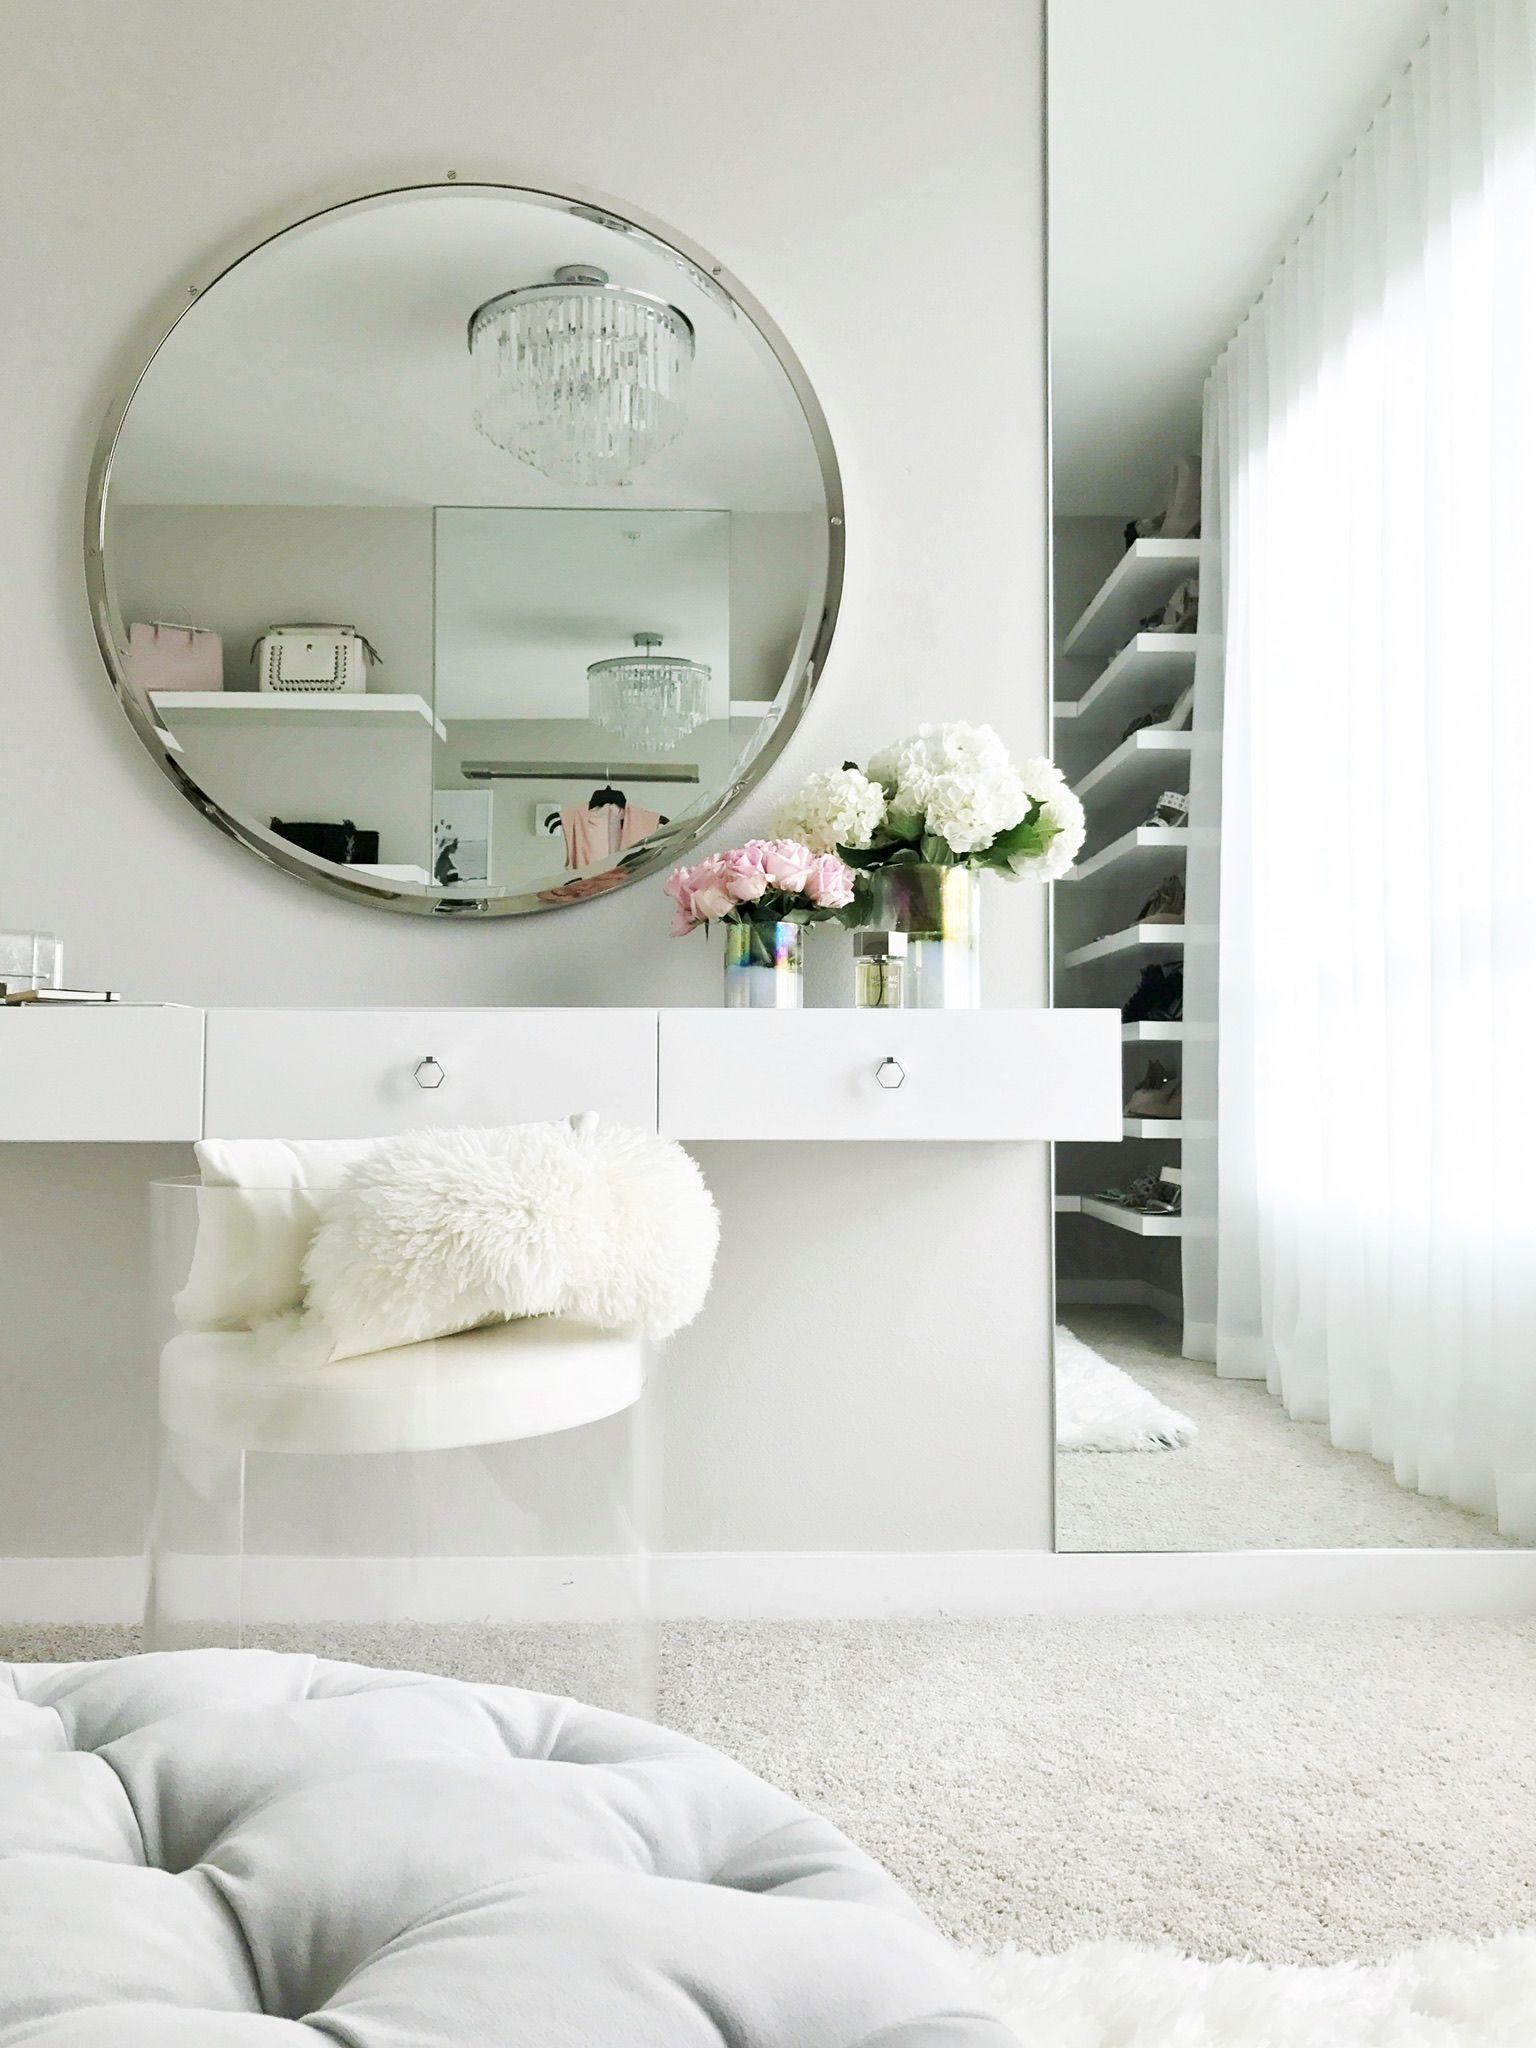 Custom floating vanity - LA Closet Design X Jessi Malay on CLOSETPHILE.com